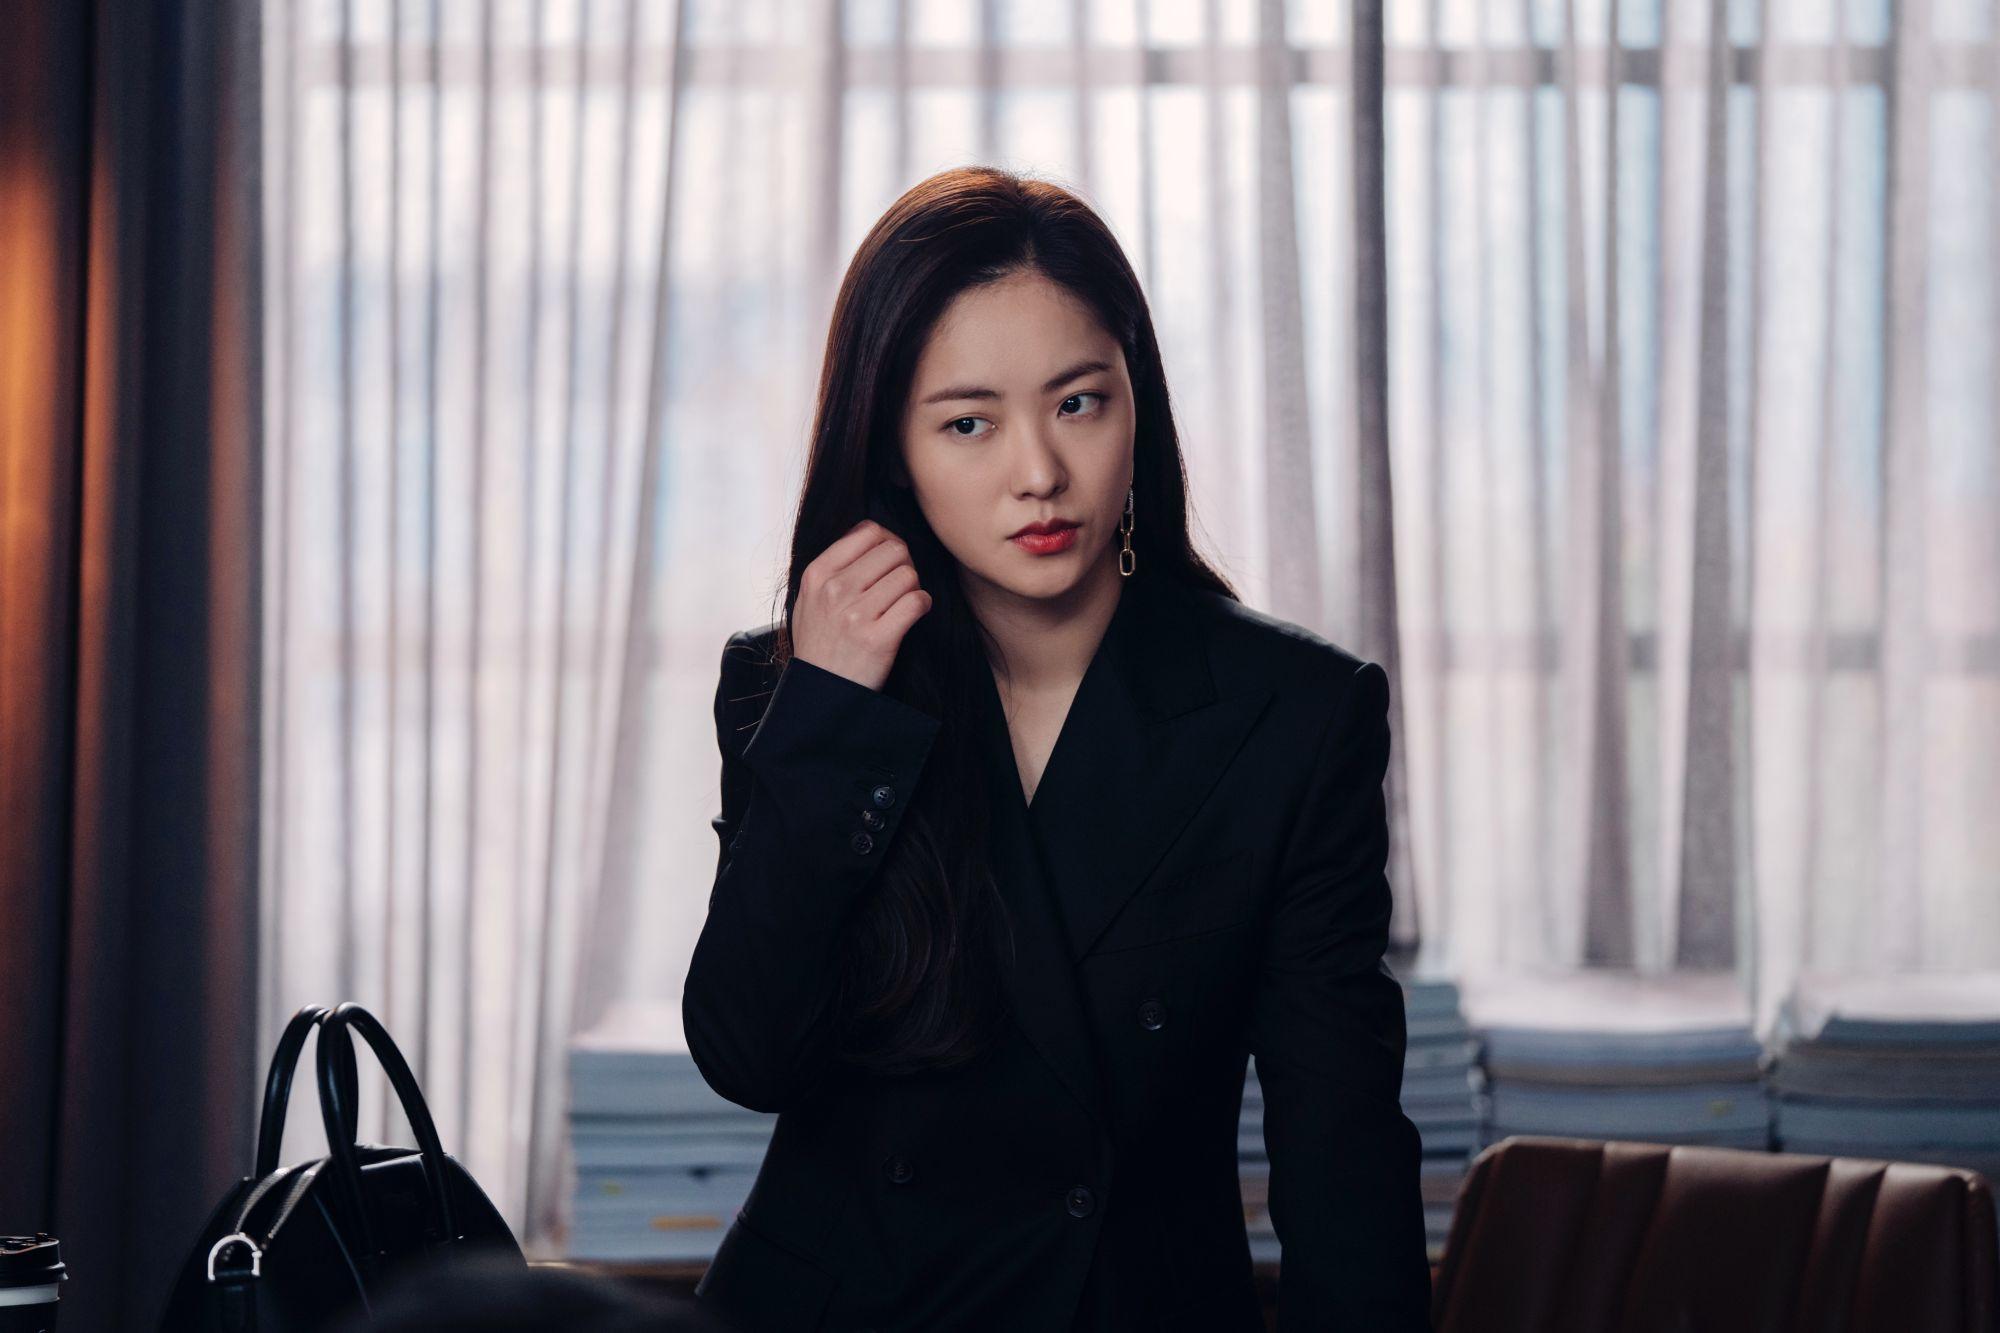 Vincenzo: What Jewellery Does Jeon Yeo-Bin Wear in the Hit Korean Drama?